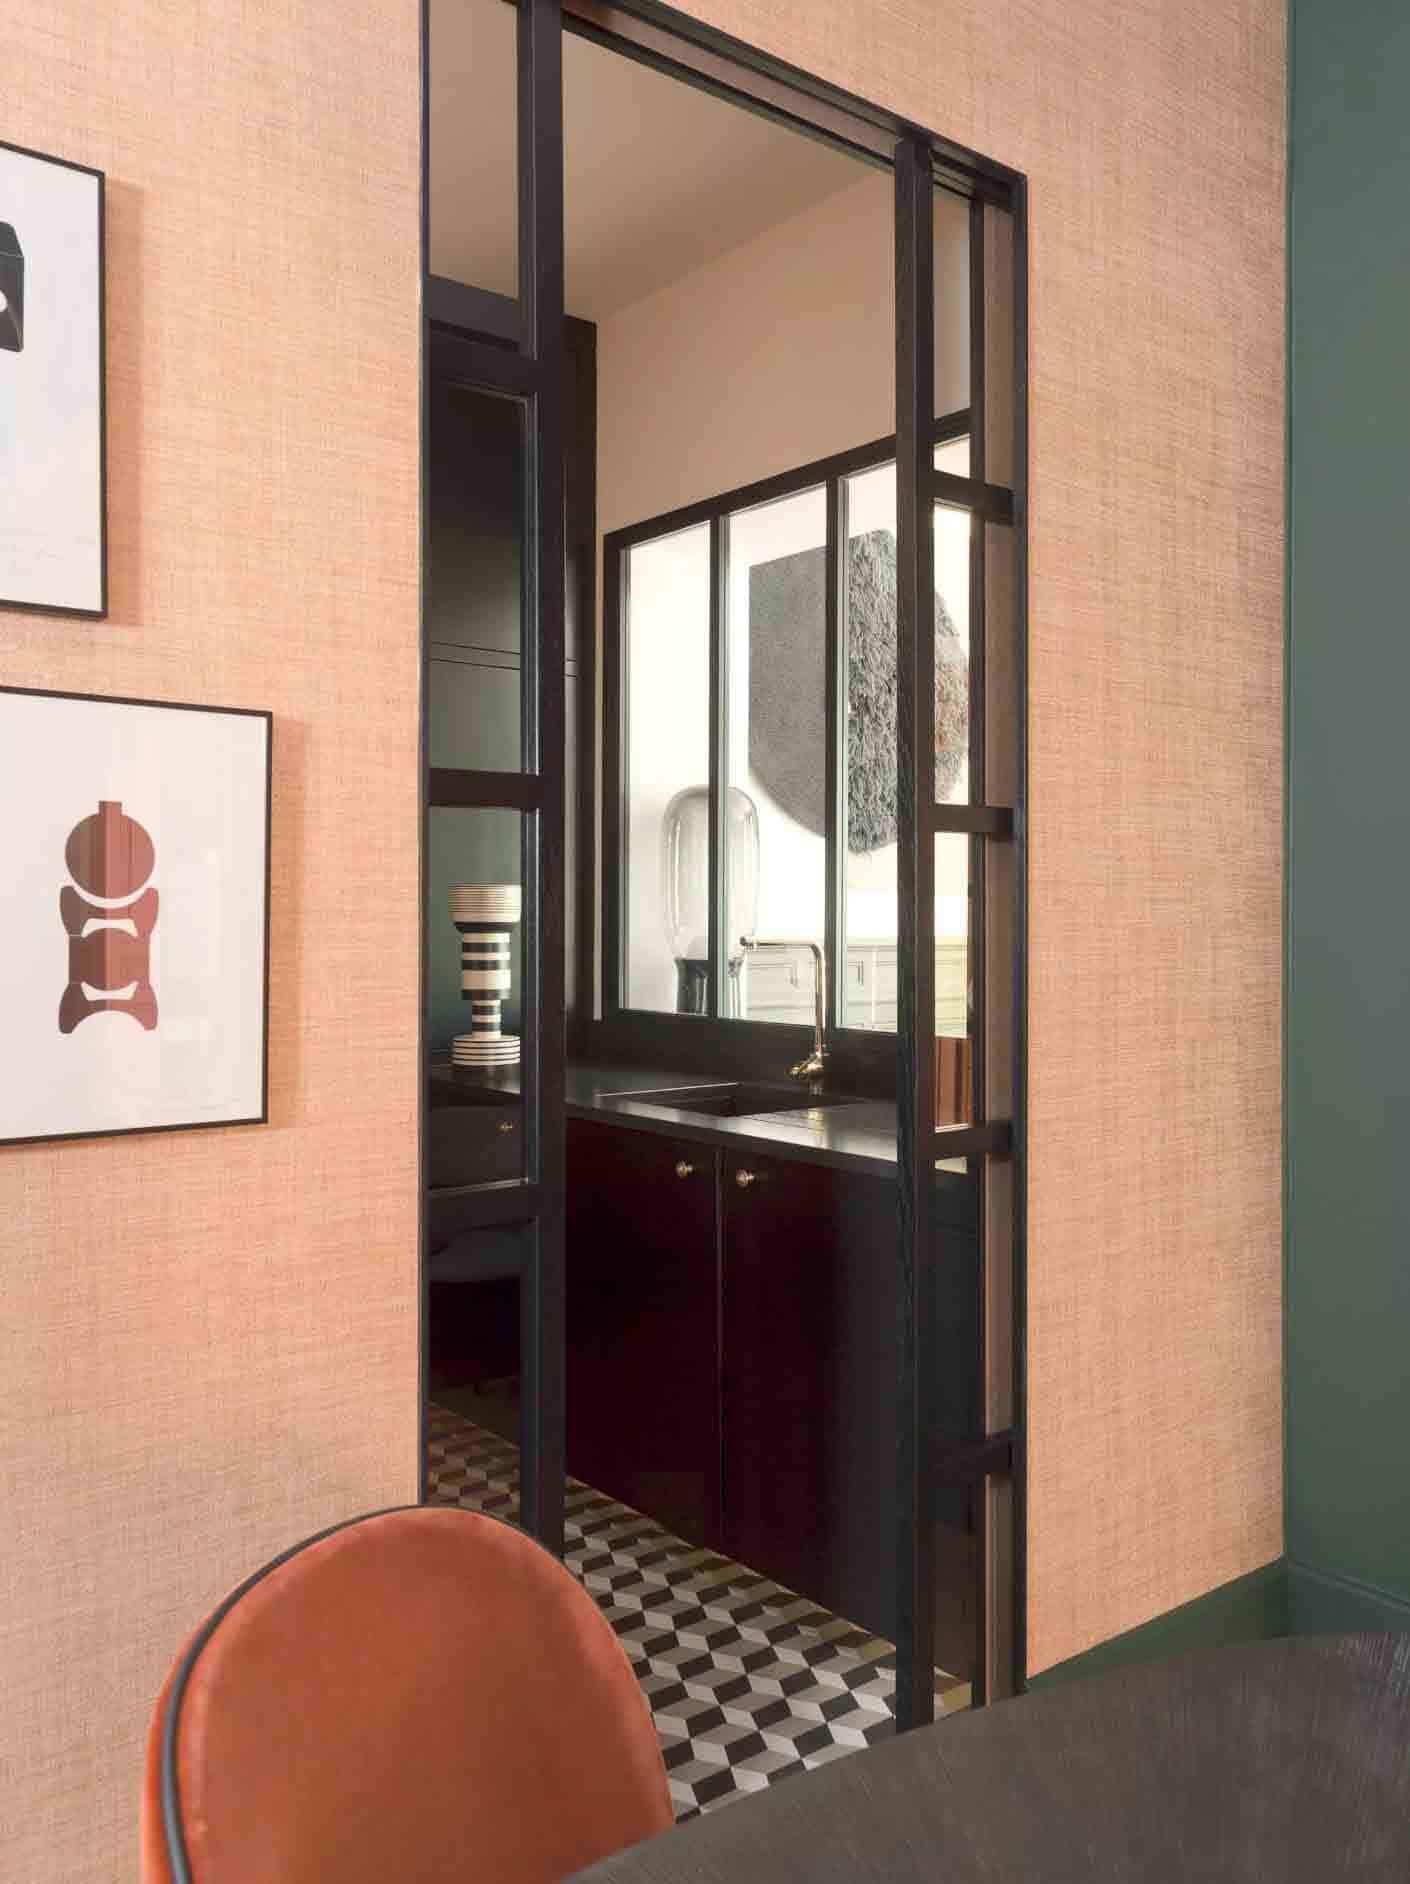 Peach The New Blush Interior Design Ideas Amp Inspirations Online